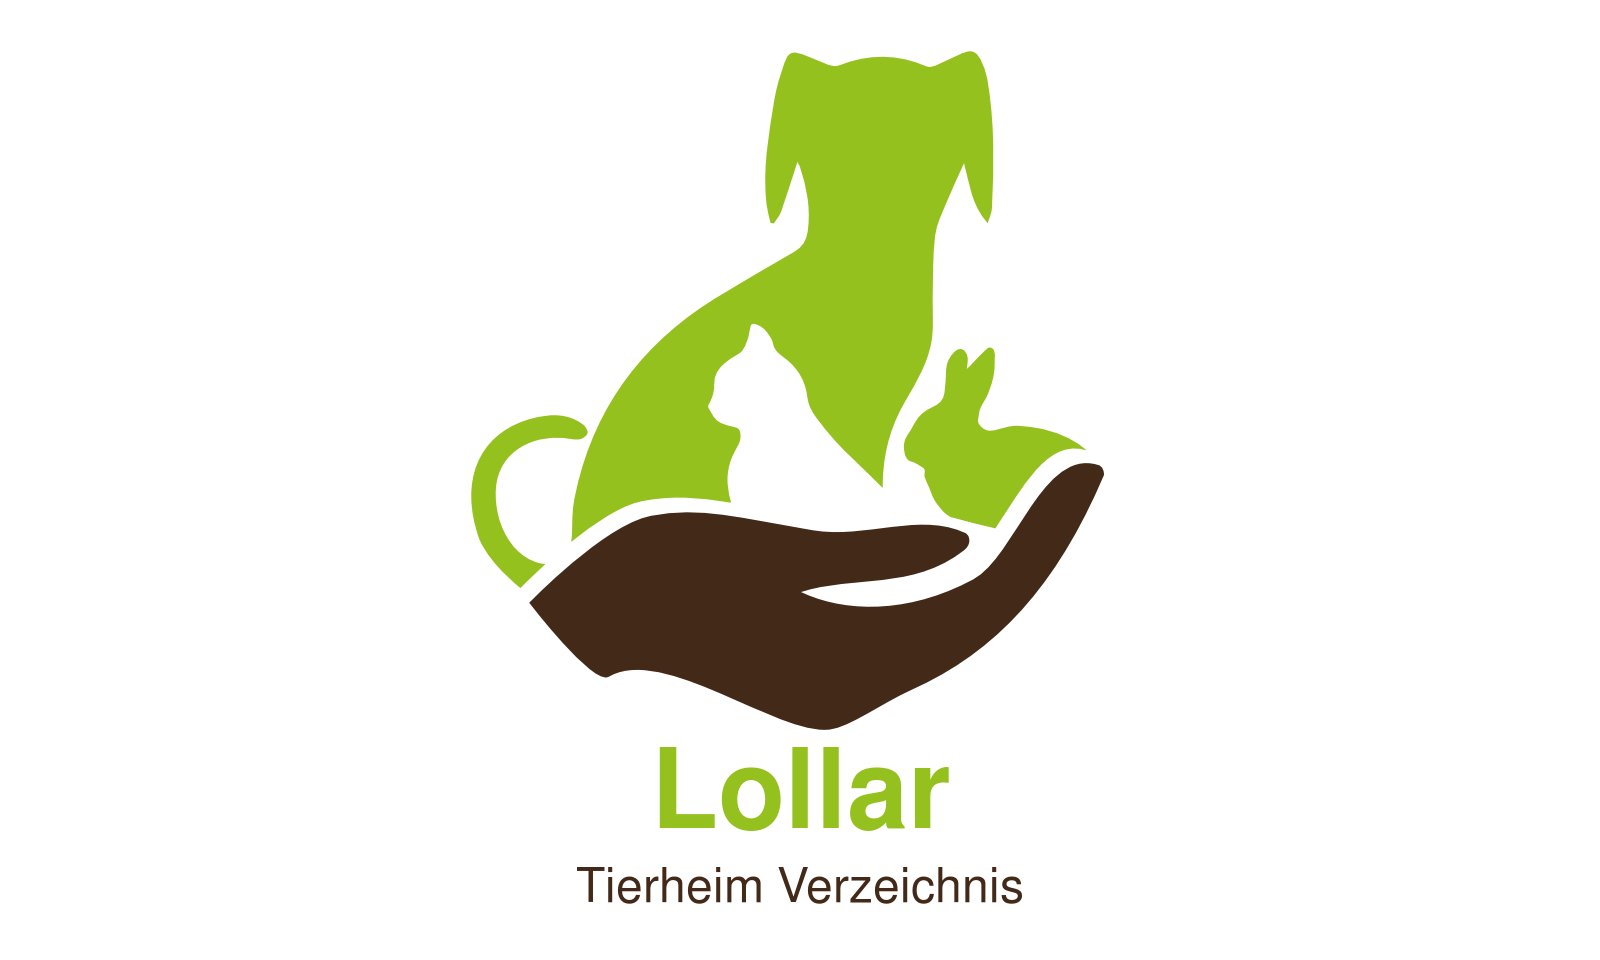 Tierheim Lollar